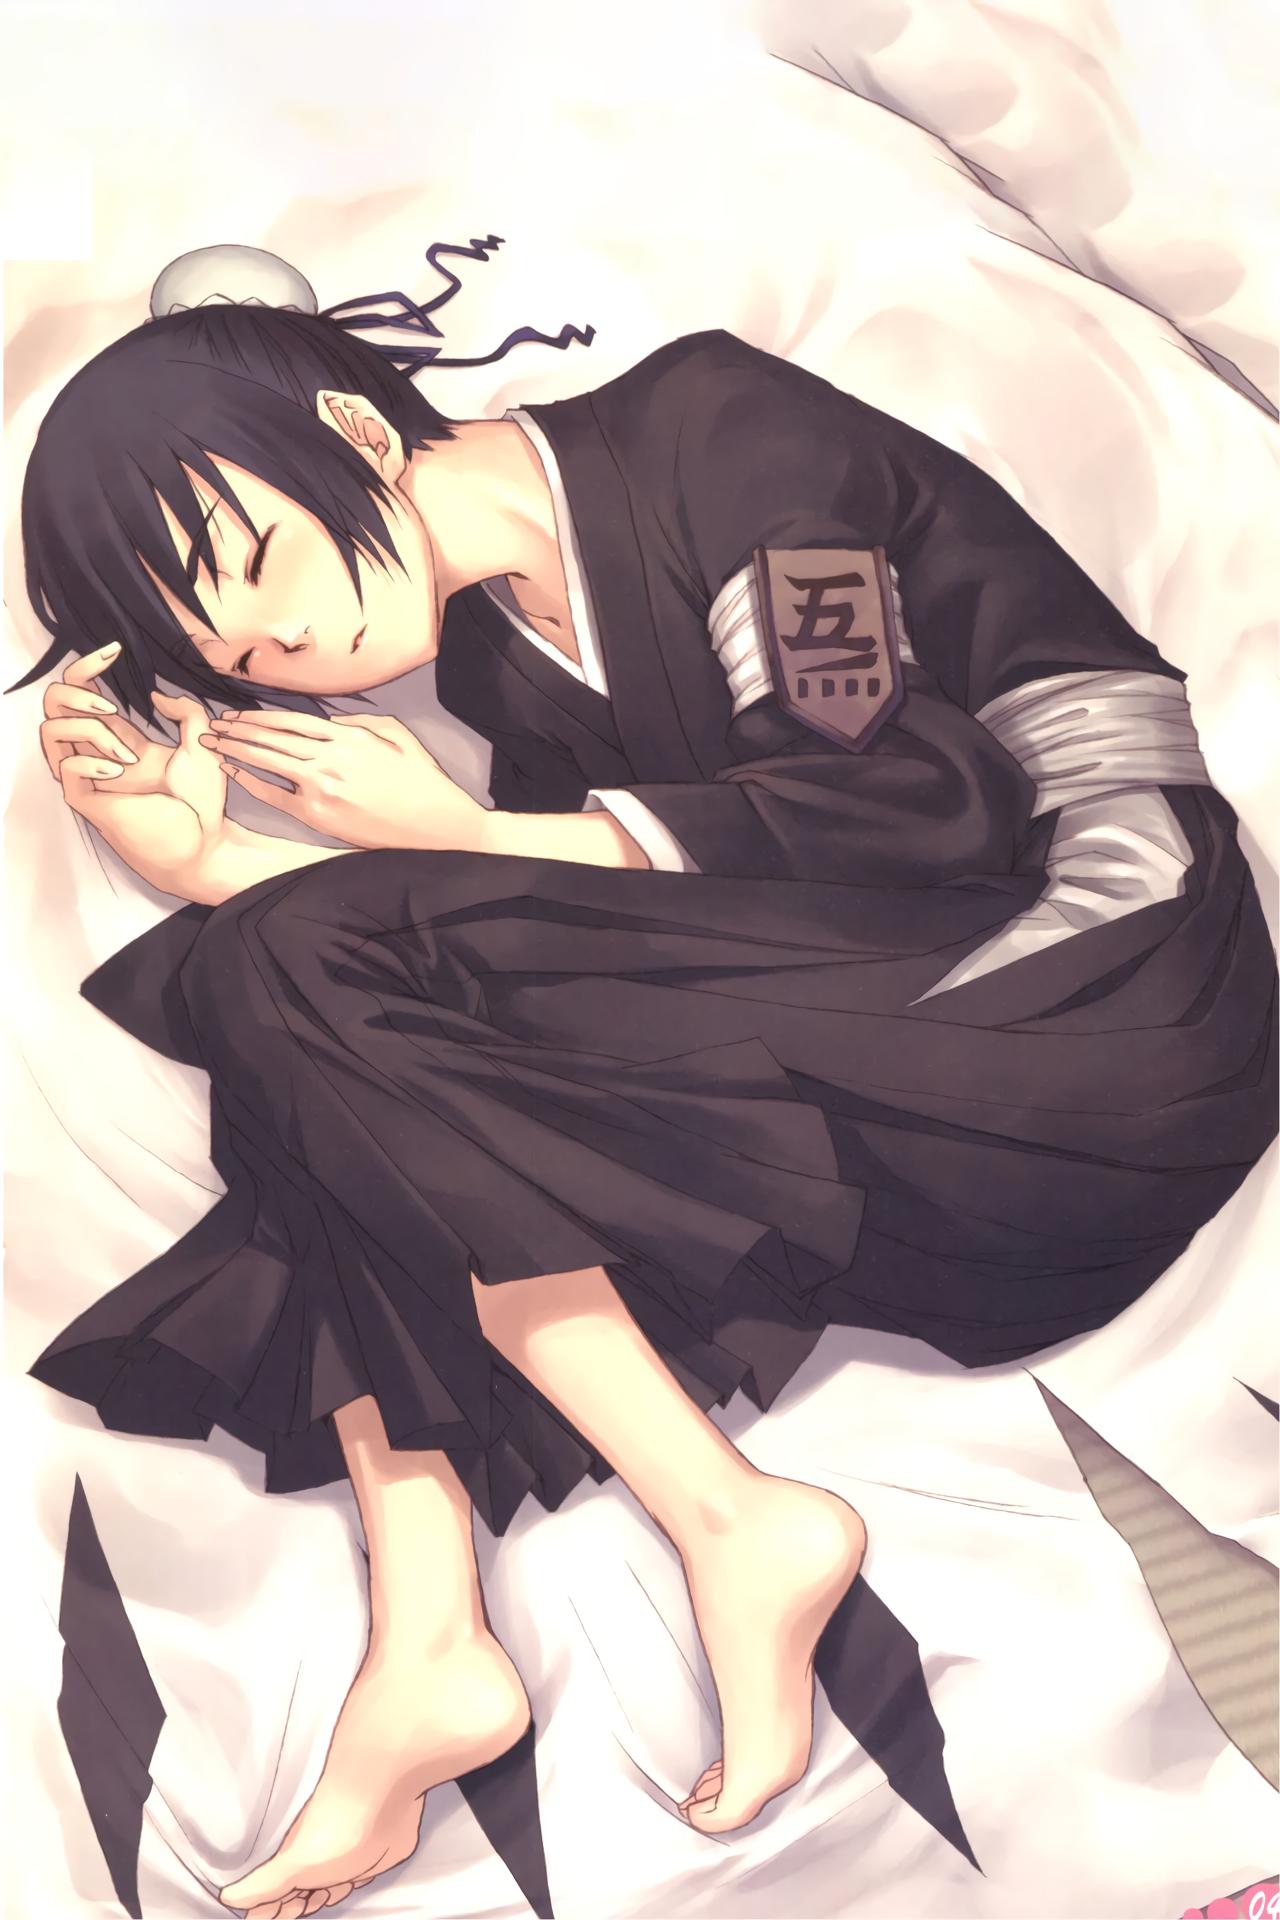 Wallpaper Anime Bleach Sleeping Hinamori Momo 1280x1920